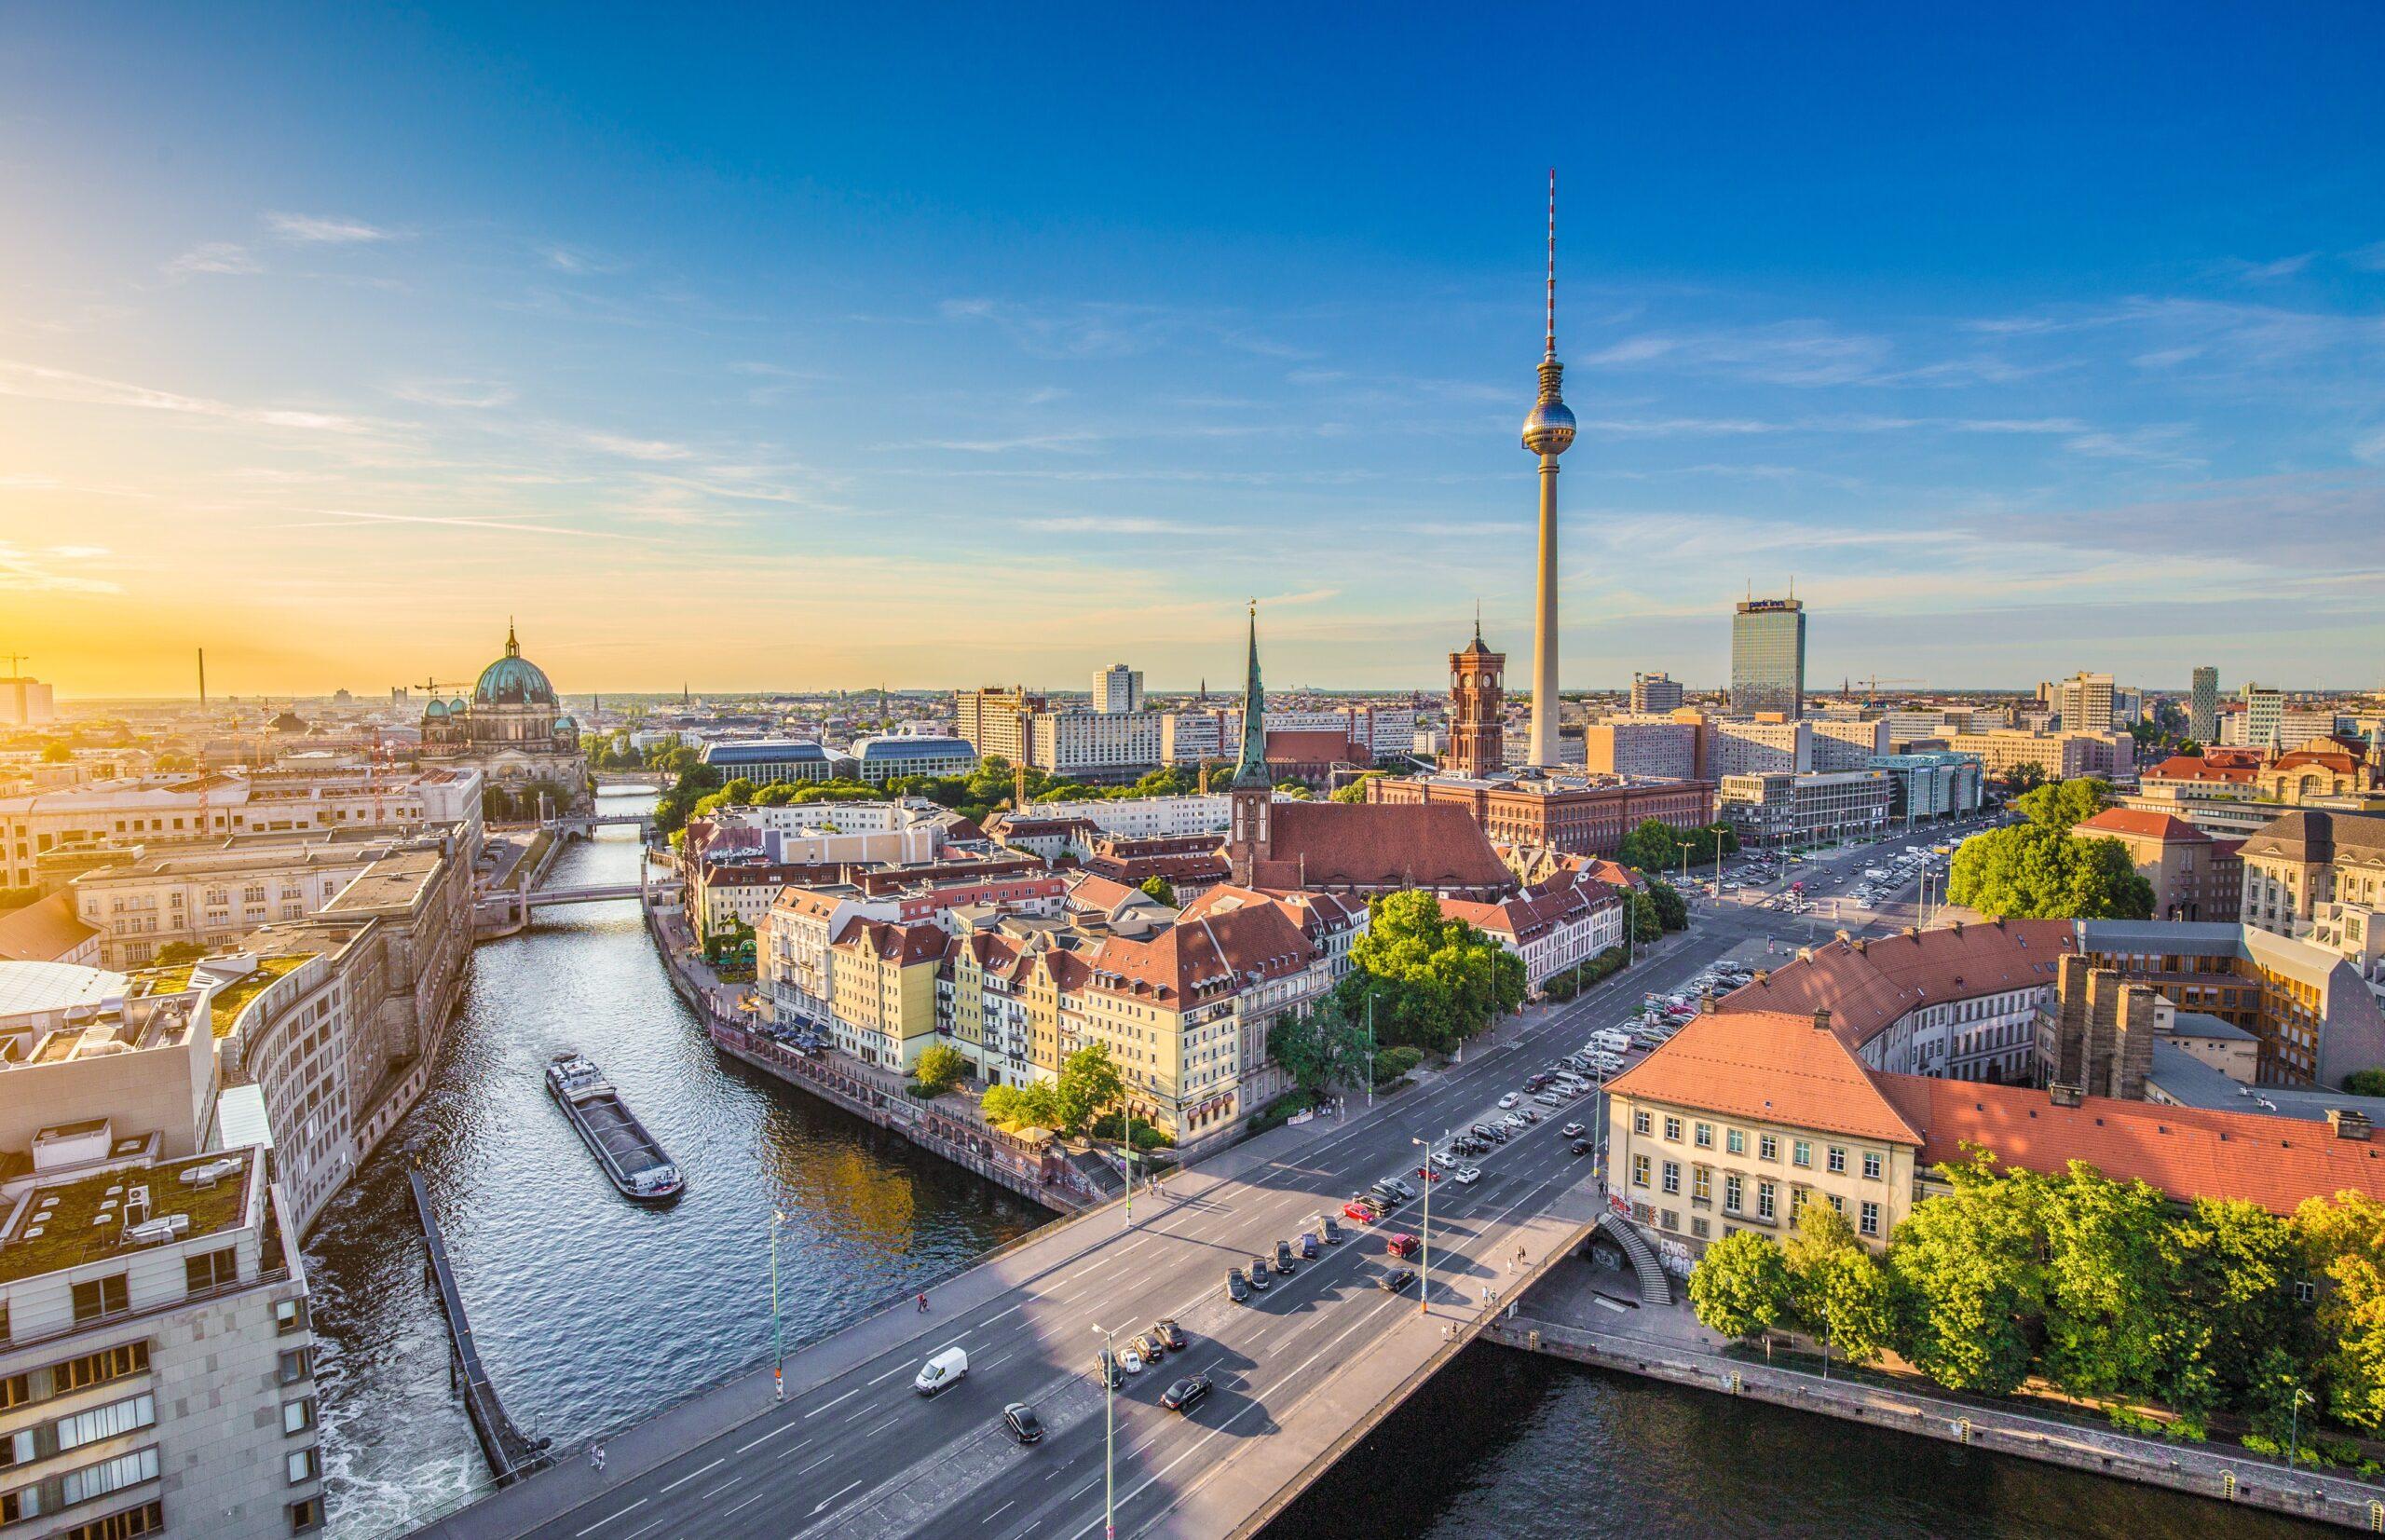 Berlin City Attractions